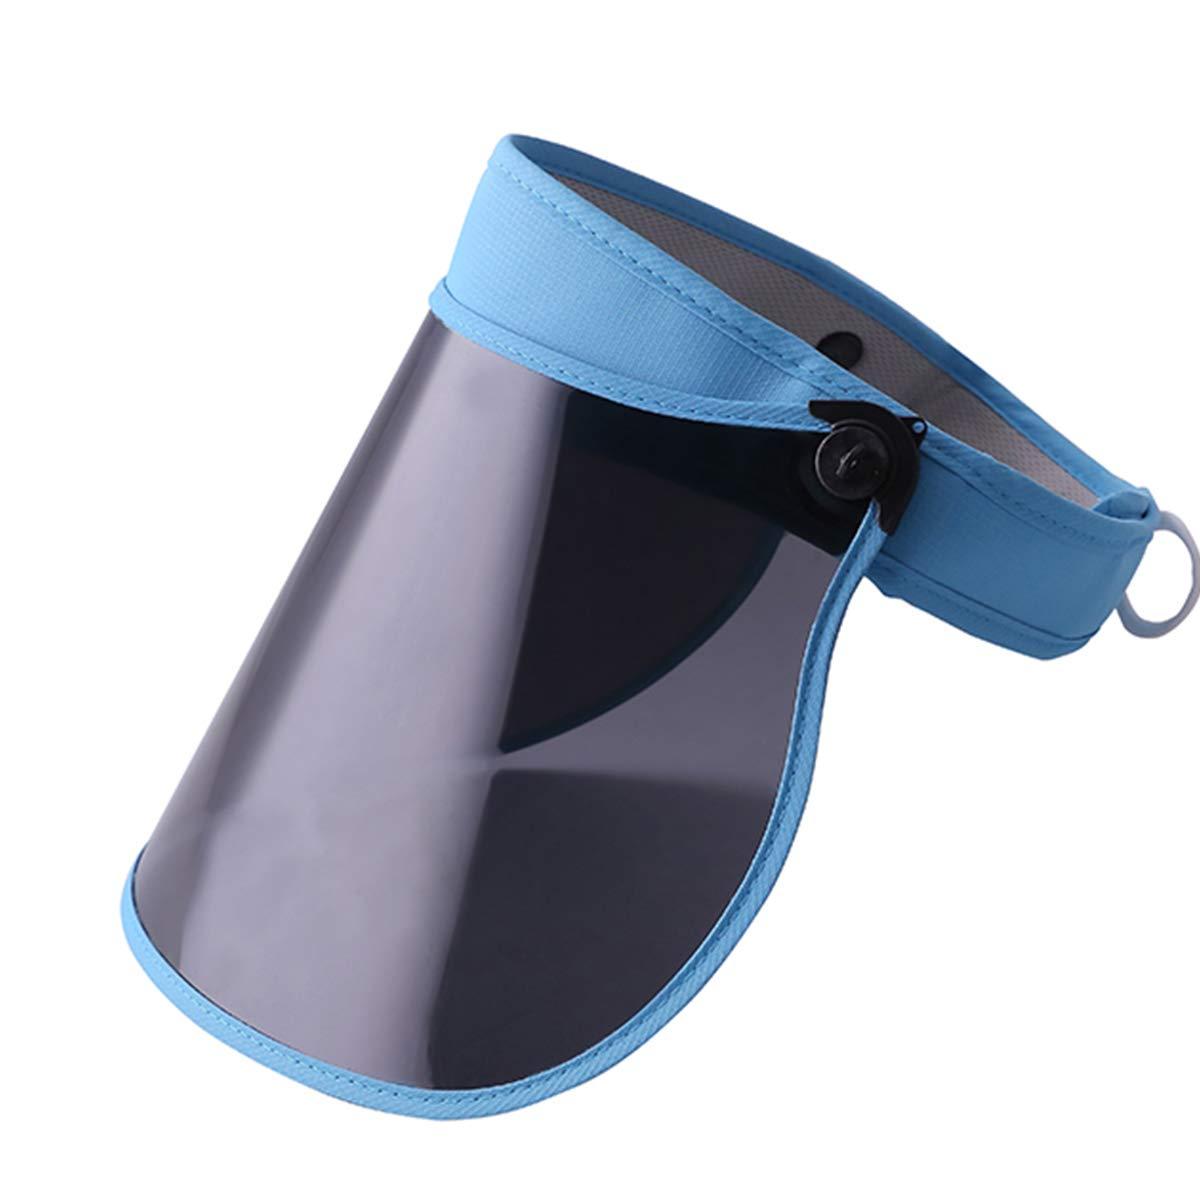 Sun Visor Hat for Women Men Beach Shield UV Protection Cap Hat Wide Brim